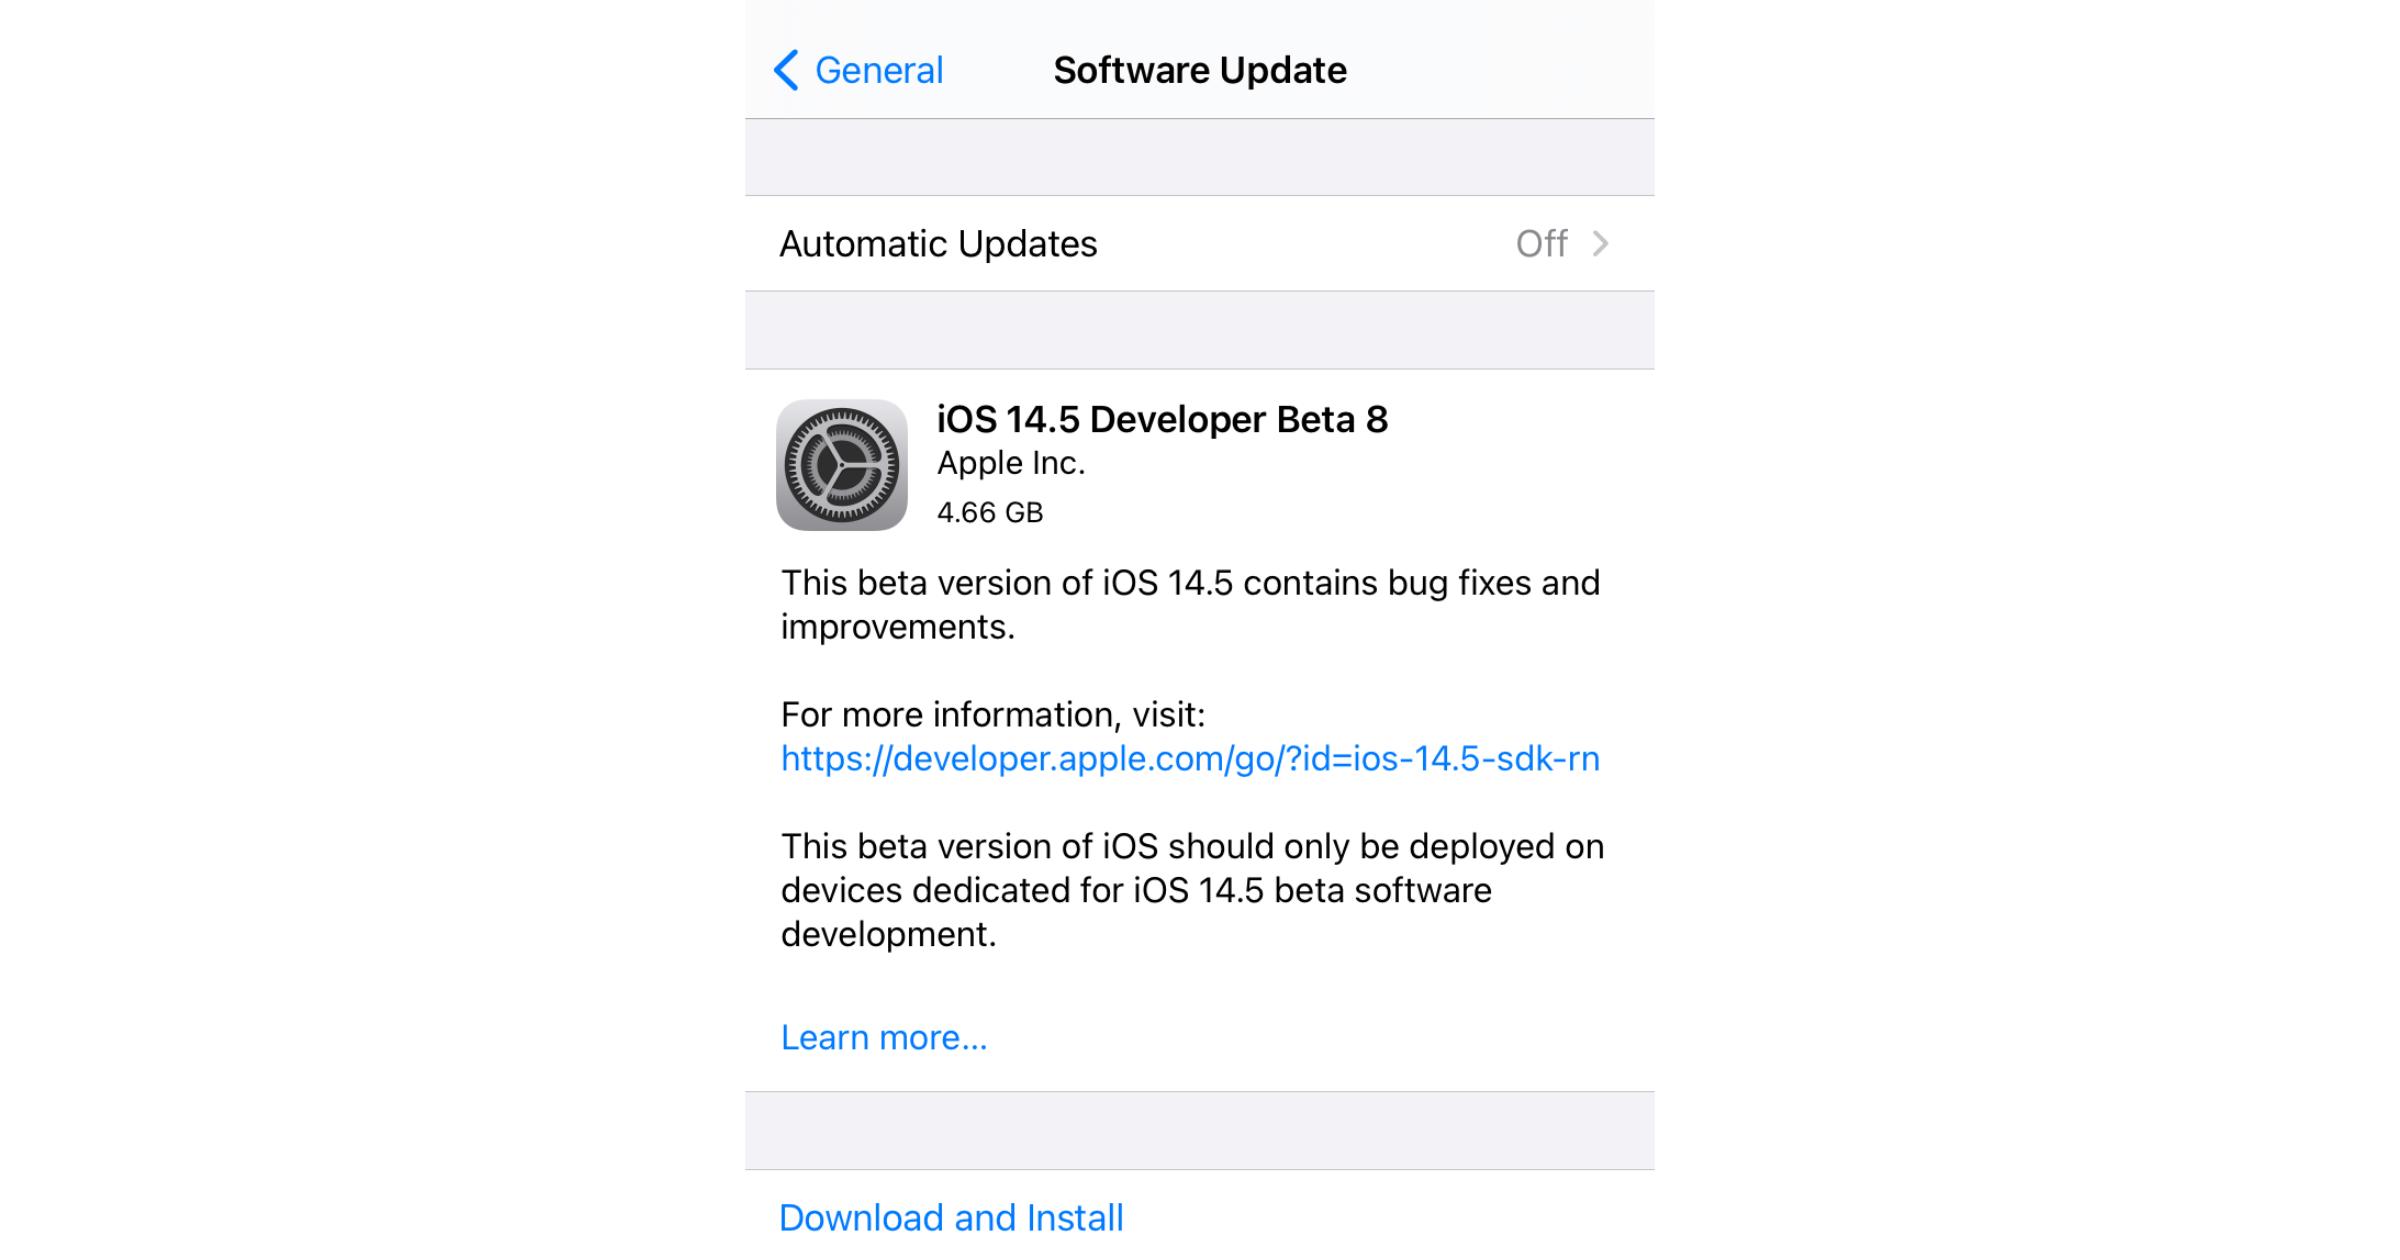 iOS 14.5 developer beta 8